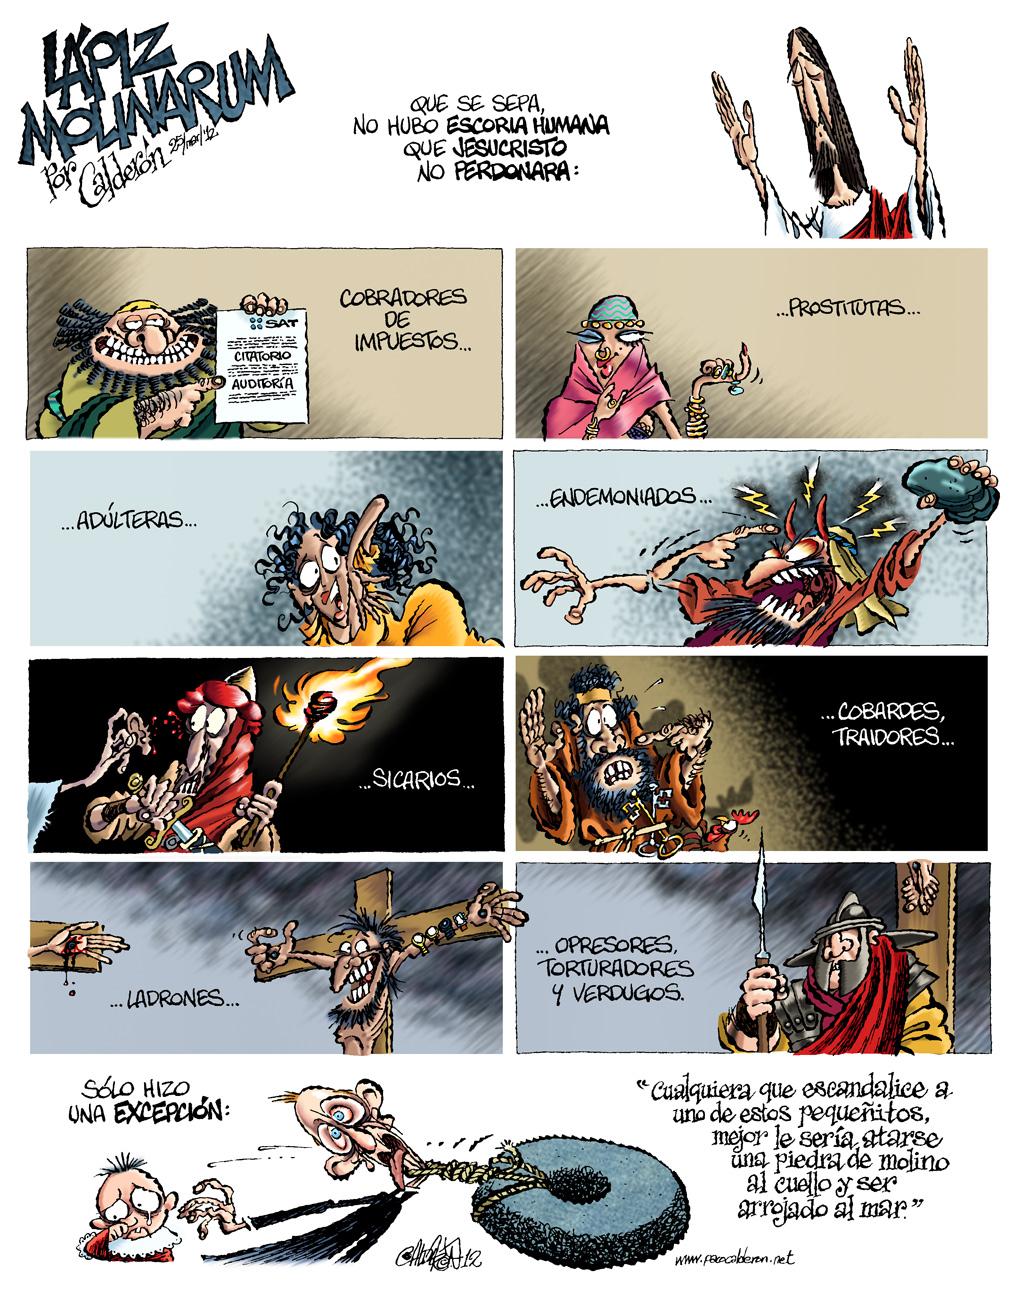 Lápiz Molinarium - Calderón